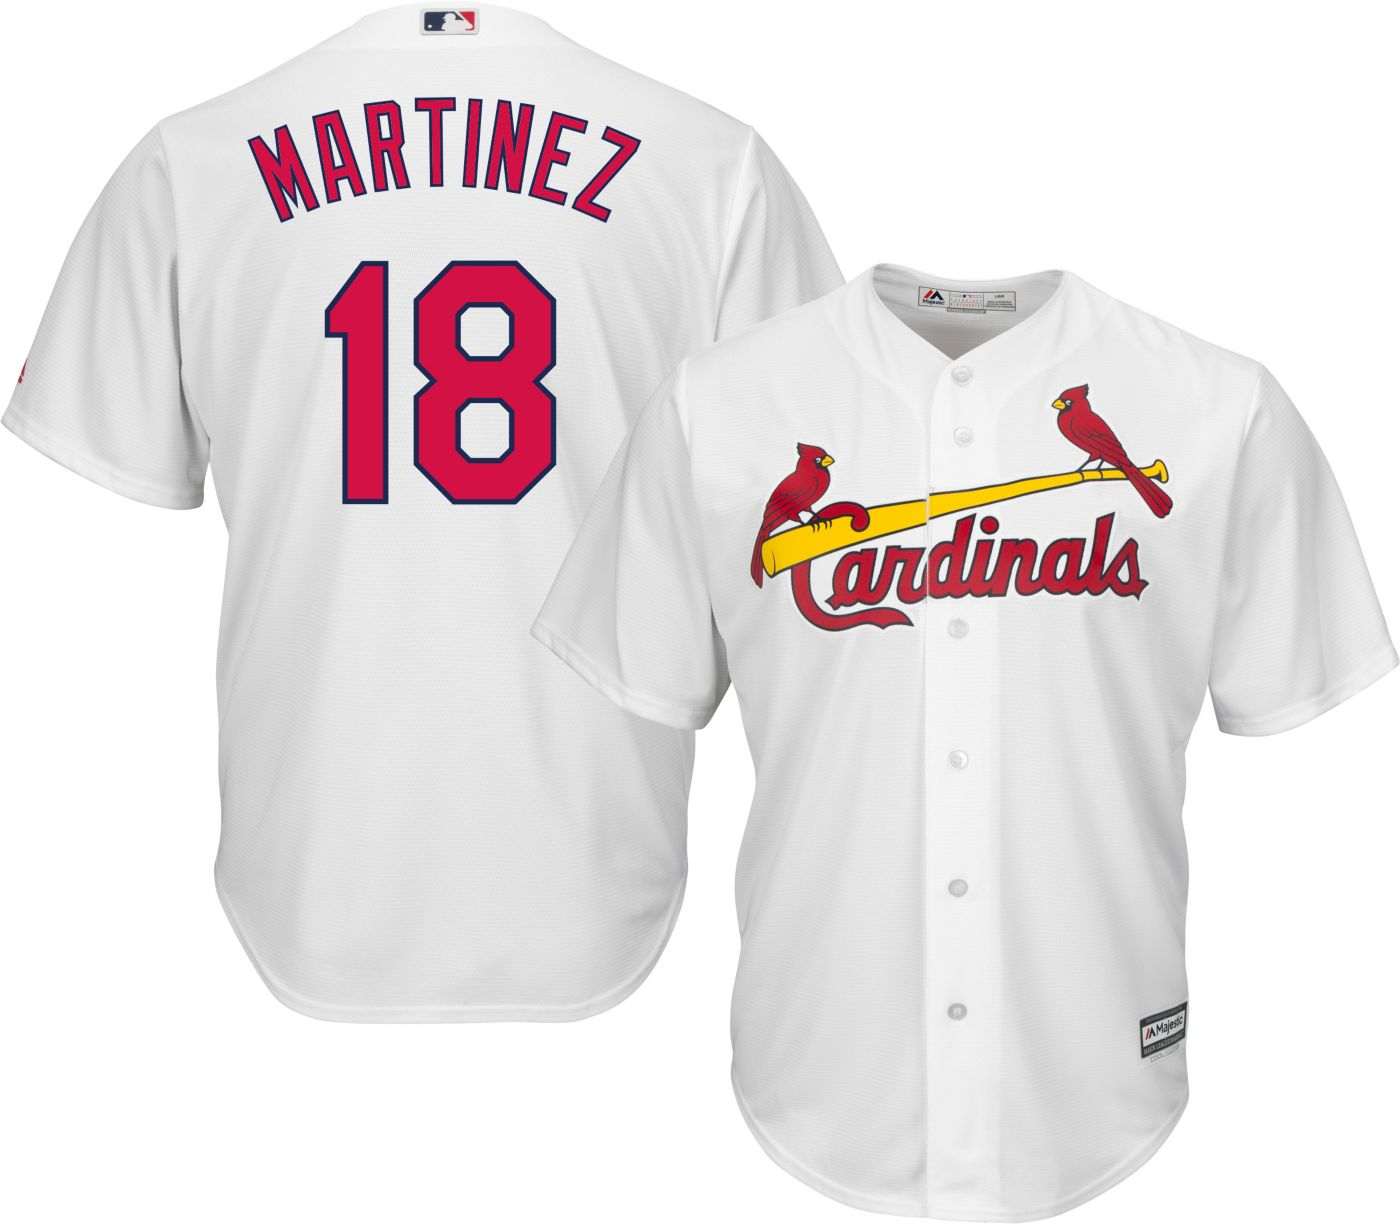 new product e9cf8 cb974 Majestic Men's Replica St. Louis Cardinals Carlos Martinez #18 Cool Base  Home White Jersey